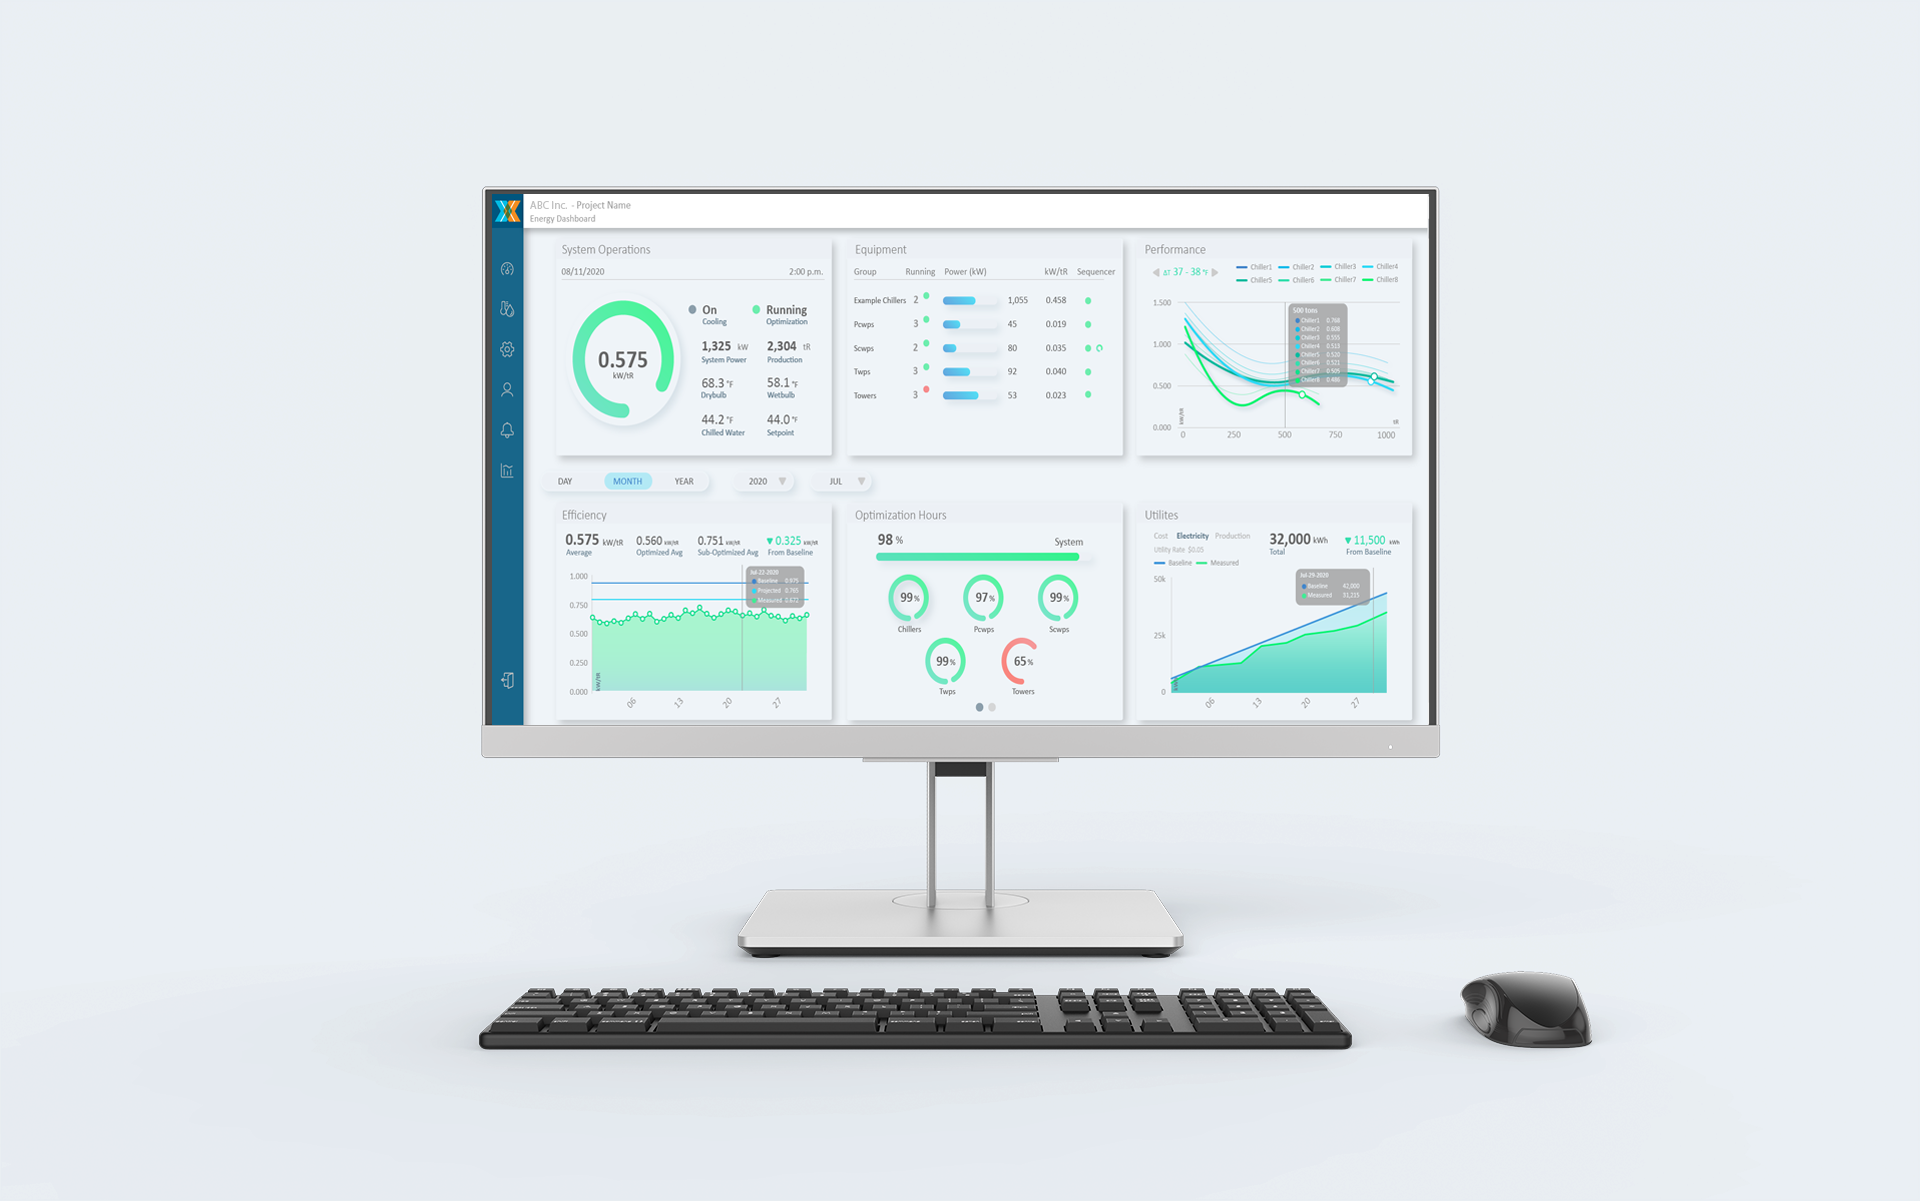 Tekworx dashboard displayed on a desktop computer monitor.